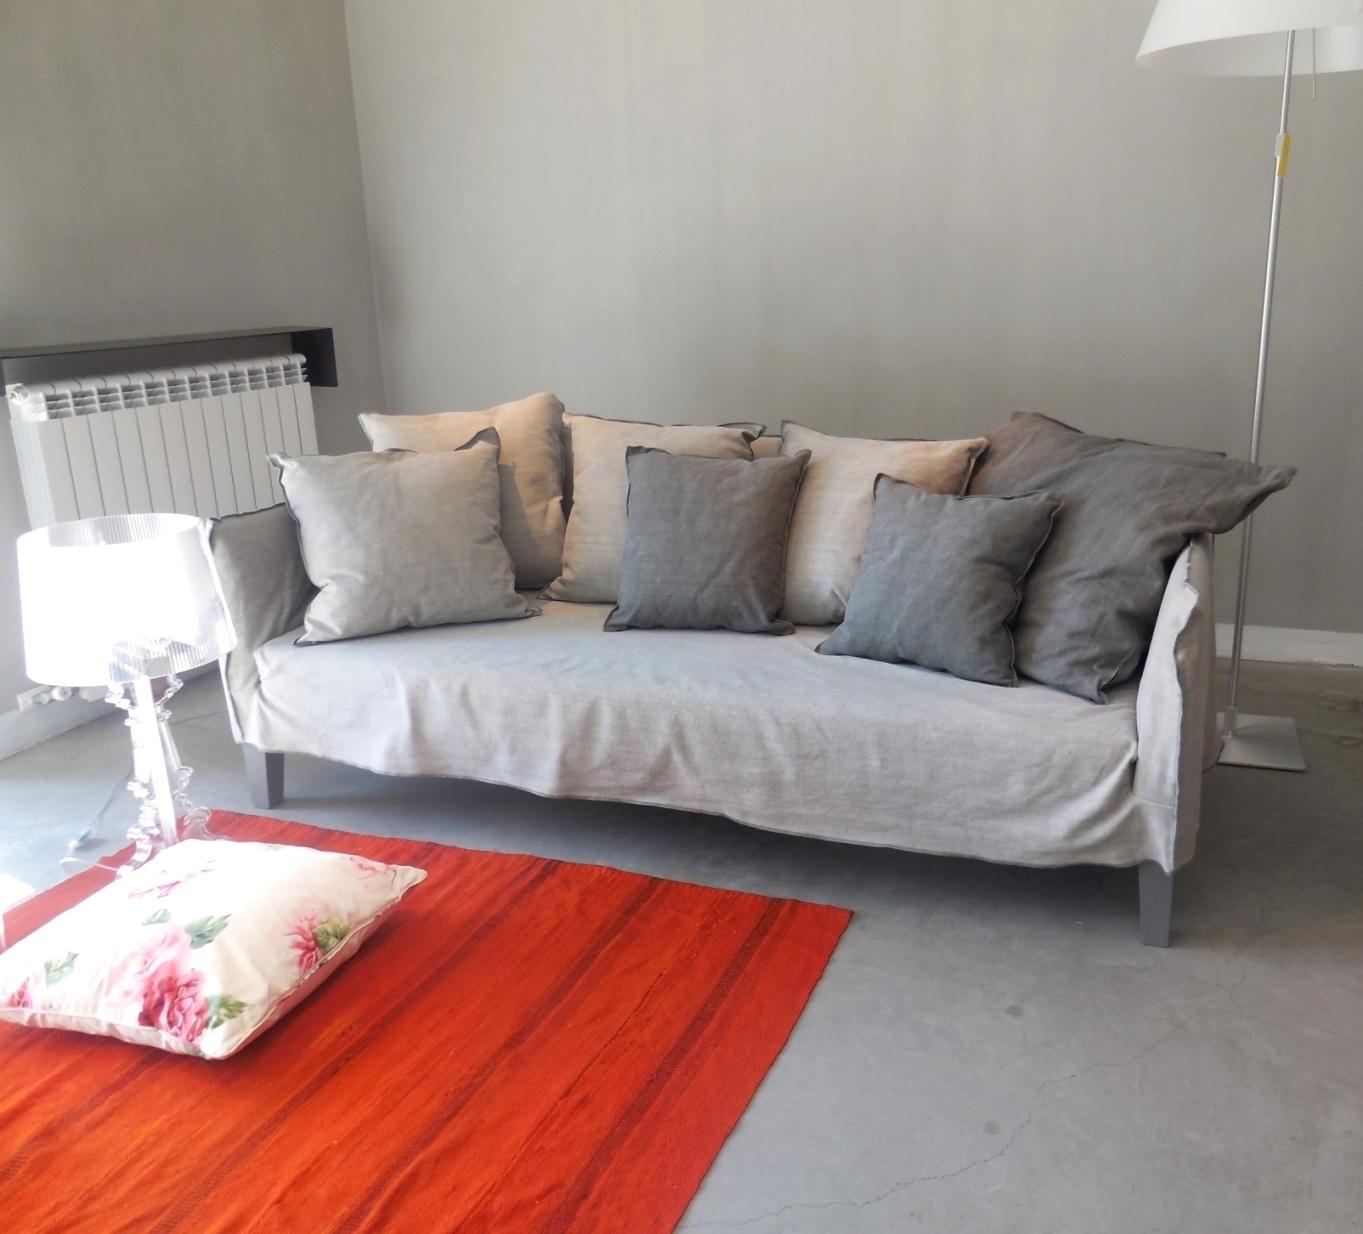 Gervasoni divano divano up 12 vendita online divano for Vendita online divani